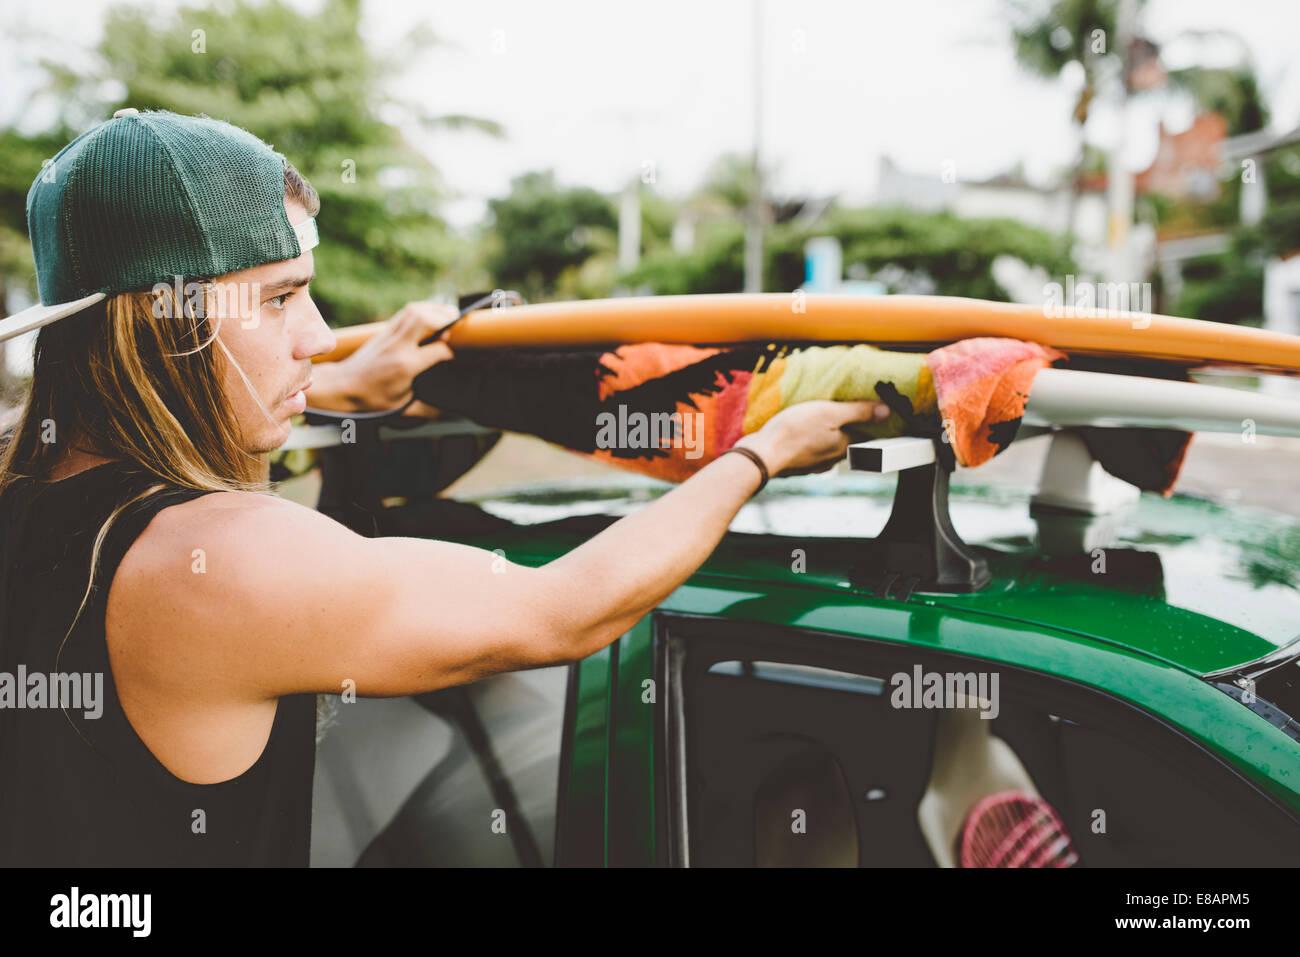 Australian surfer preparing for trip - Stock Image